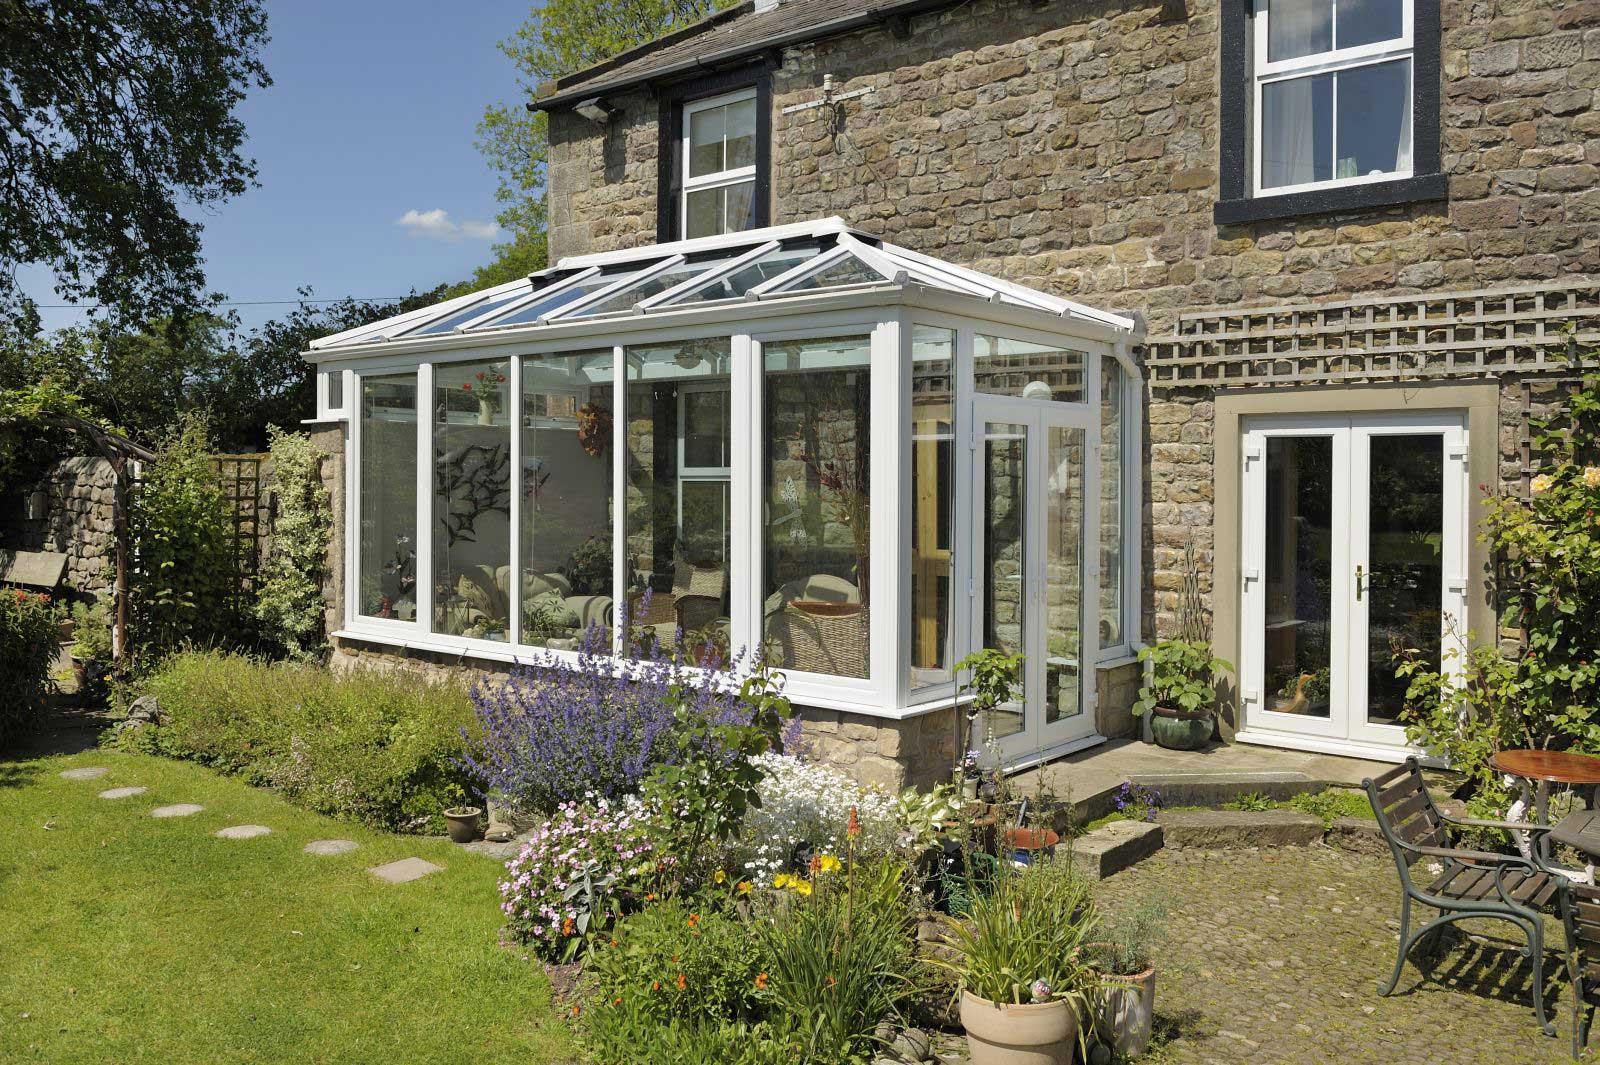 upvc edwardian conservatories in yorkshire